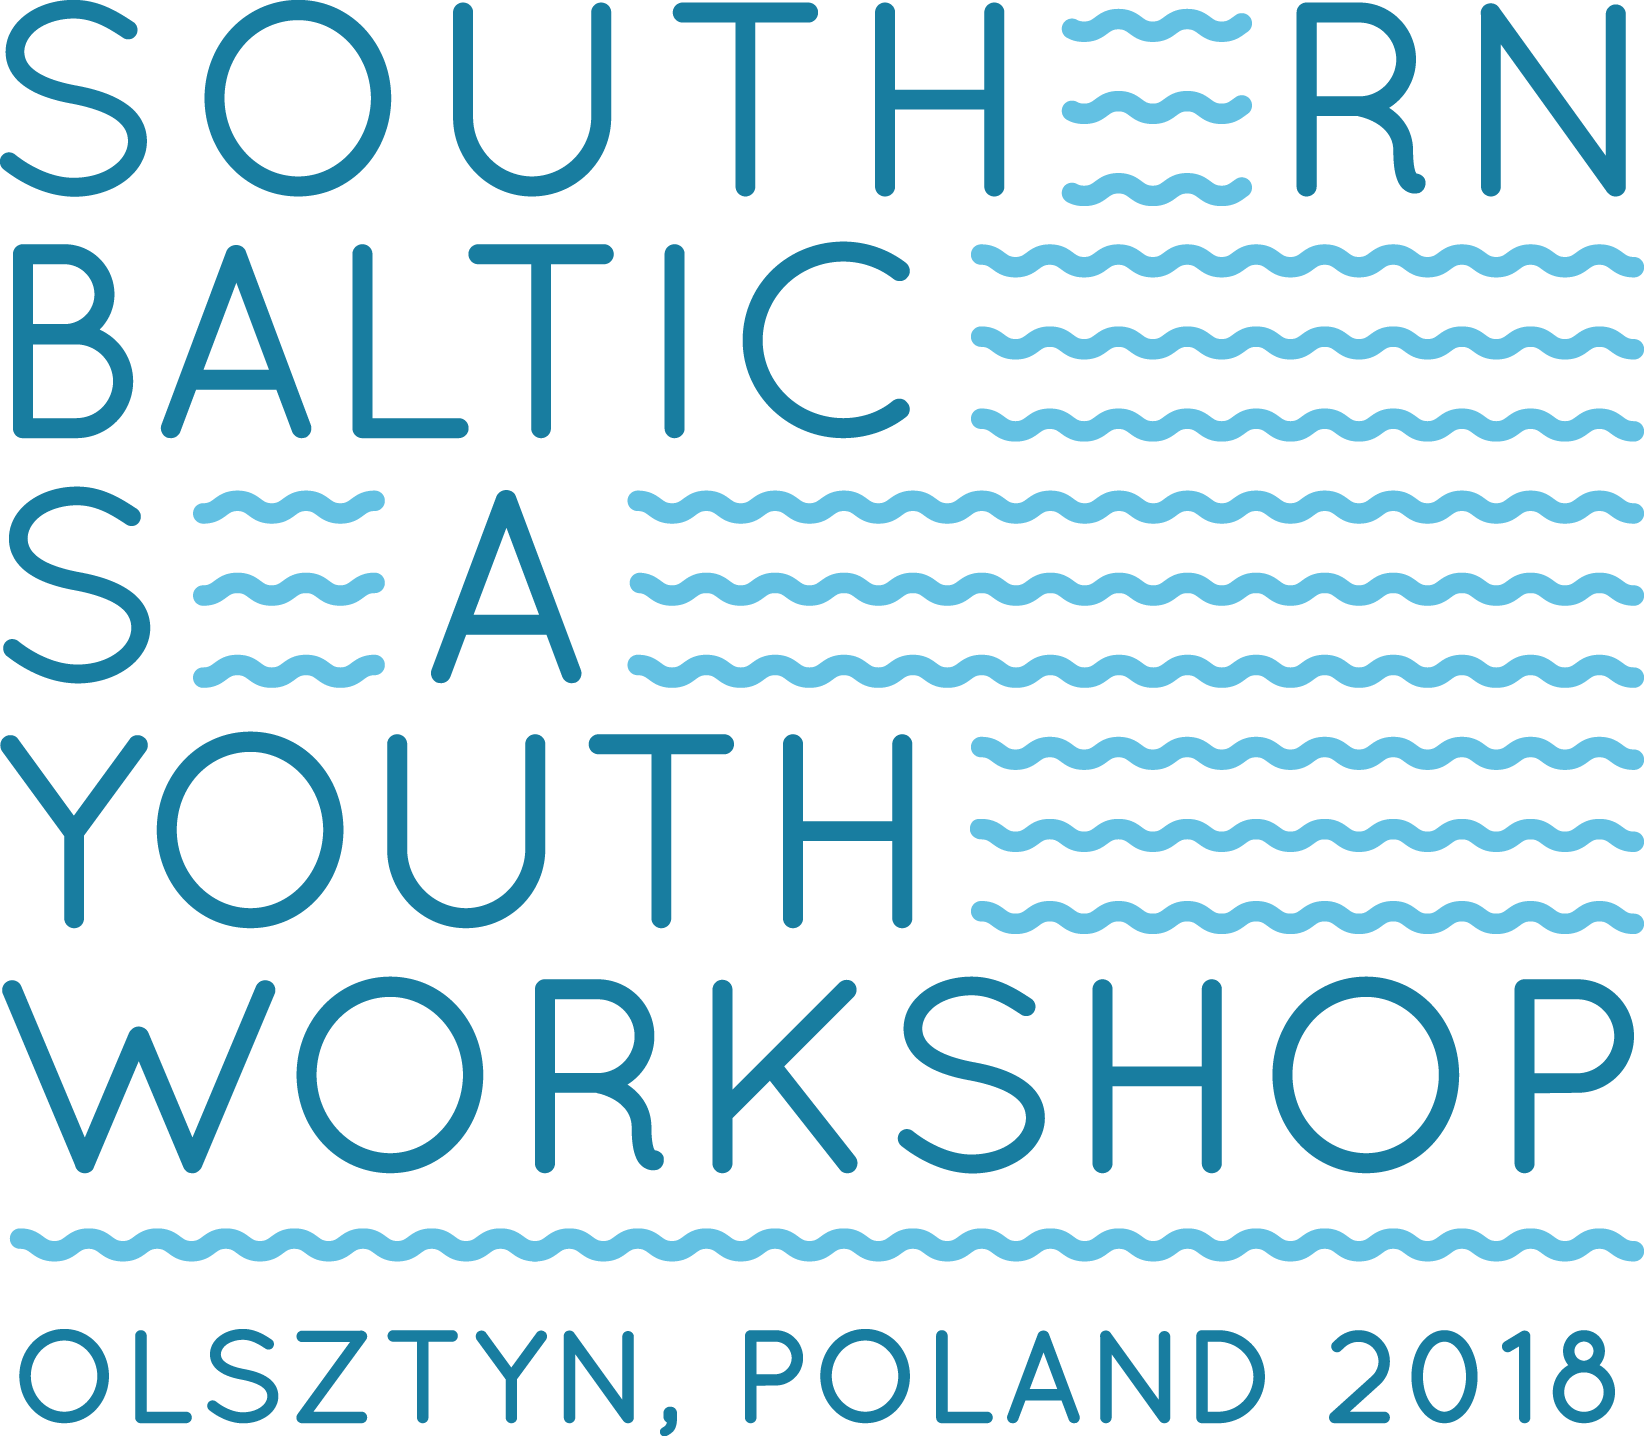 Baltic_sea_logo_color